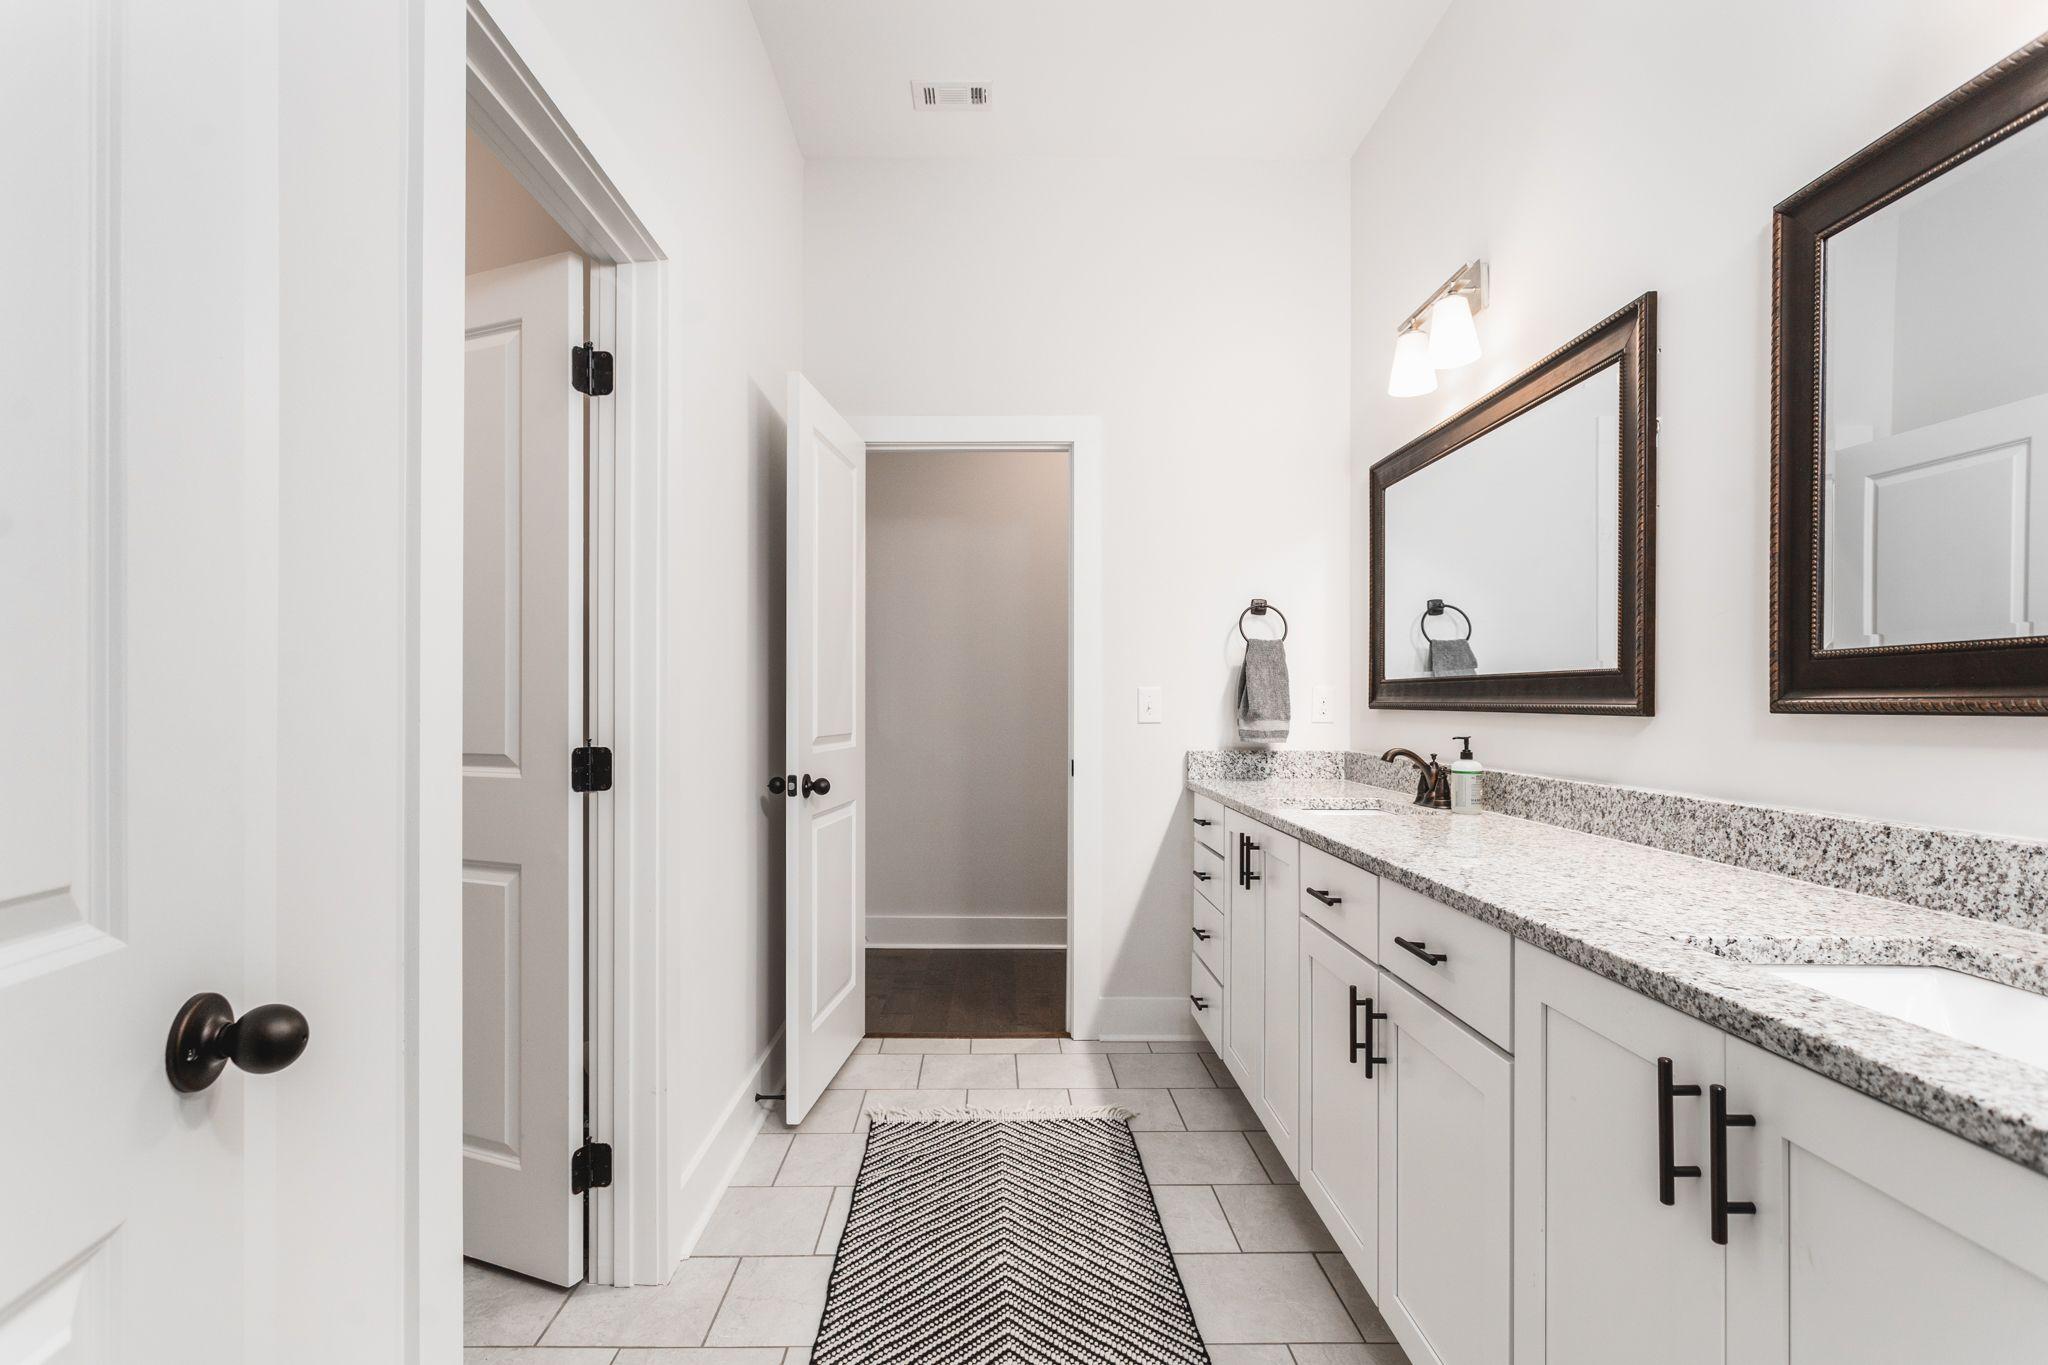 Bathroom featured in The Sawgrass By Holland Homes in Birmingham, AL